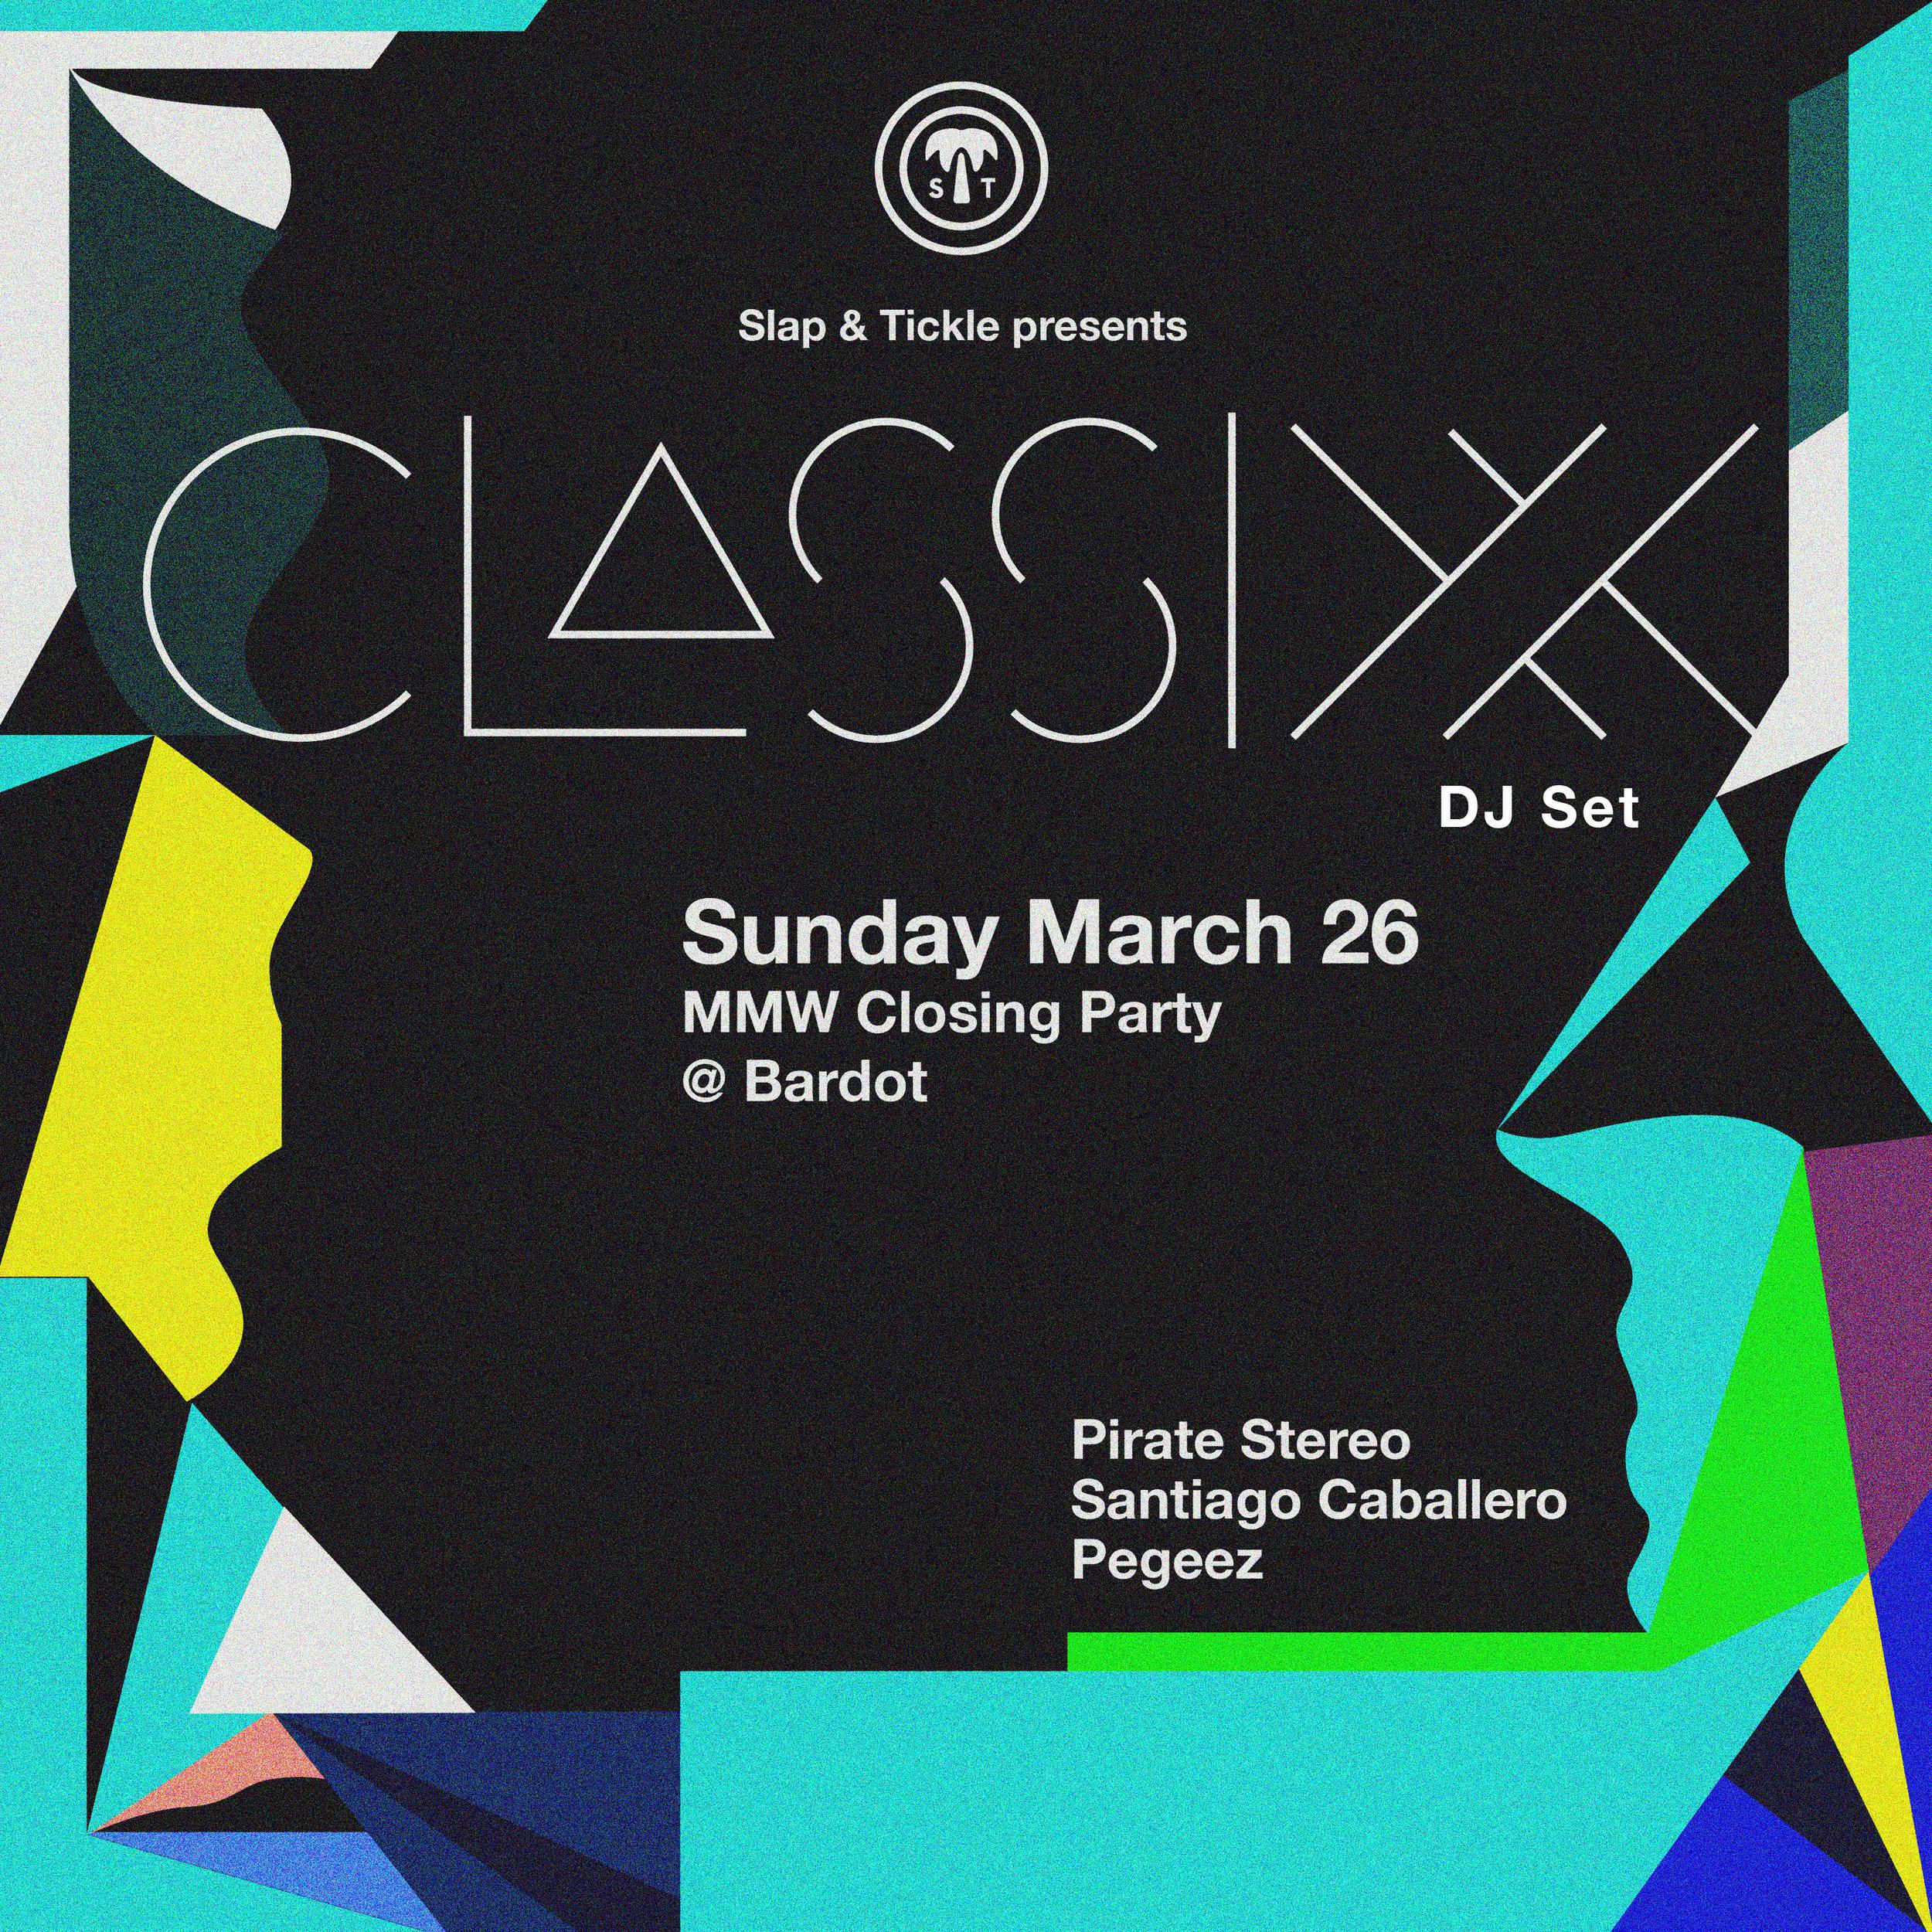 classix_finaledit2_march26.jpg